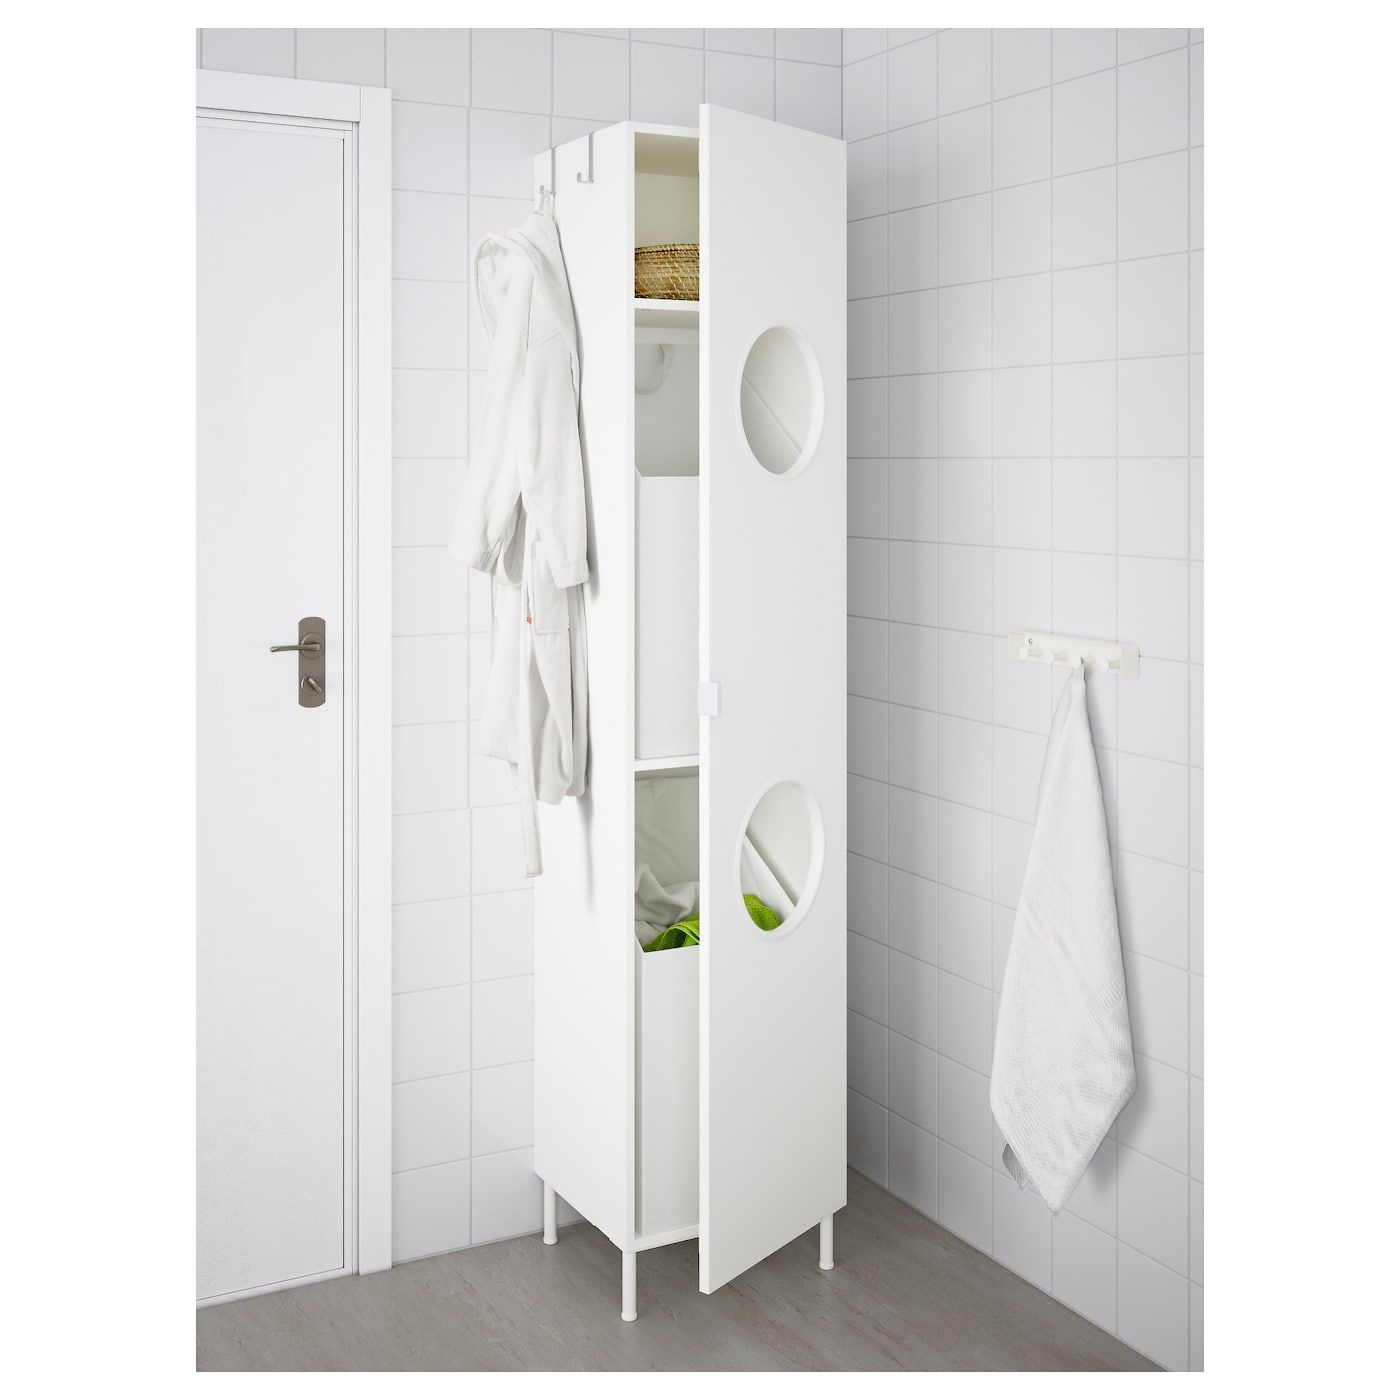 Lillangen Wascheschrank Weiss In 2019 Laundry Cabinets Ikea